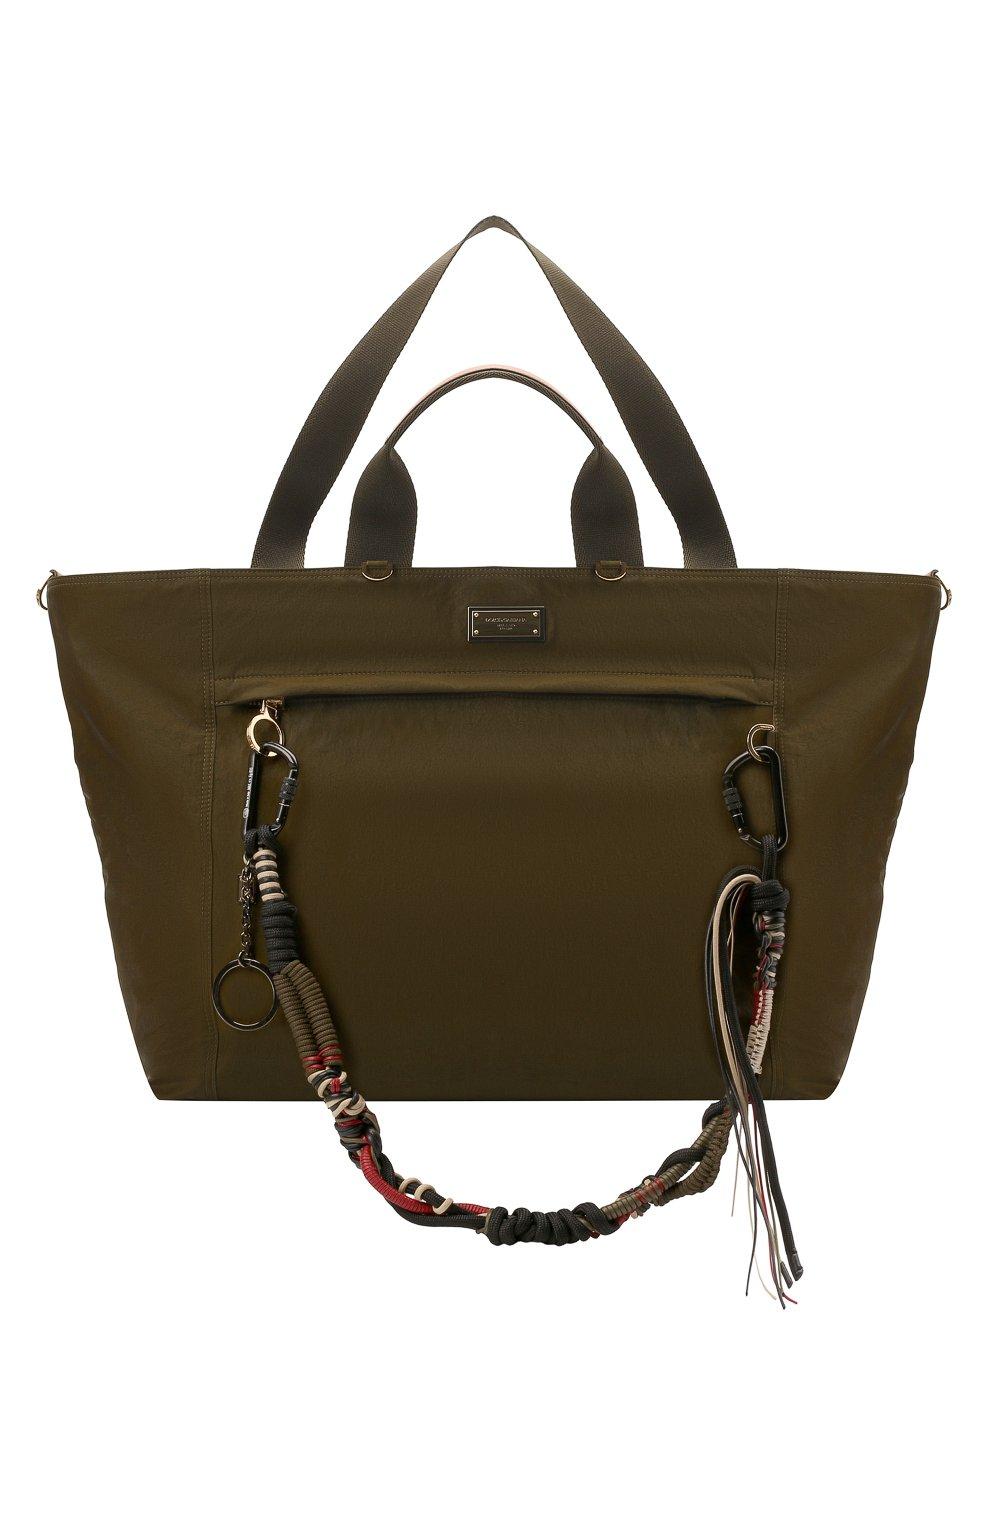 Мужская дорожная сумка nero sicilia dna DOLCE & GABBANA хаки цвета, арт. BM1958/A0244 | Фото 1